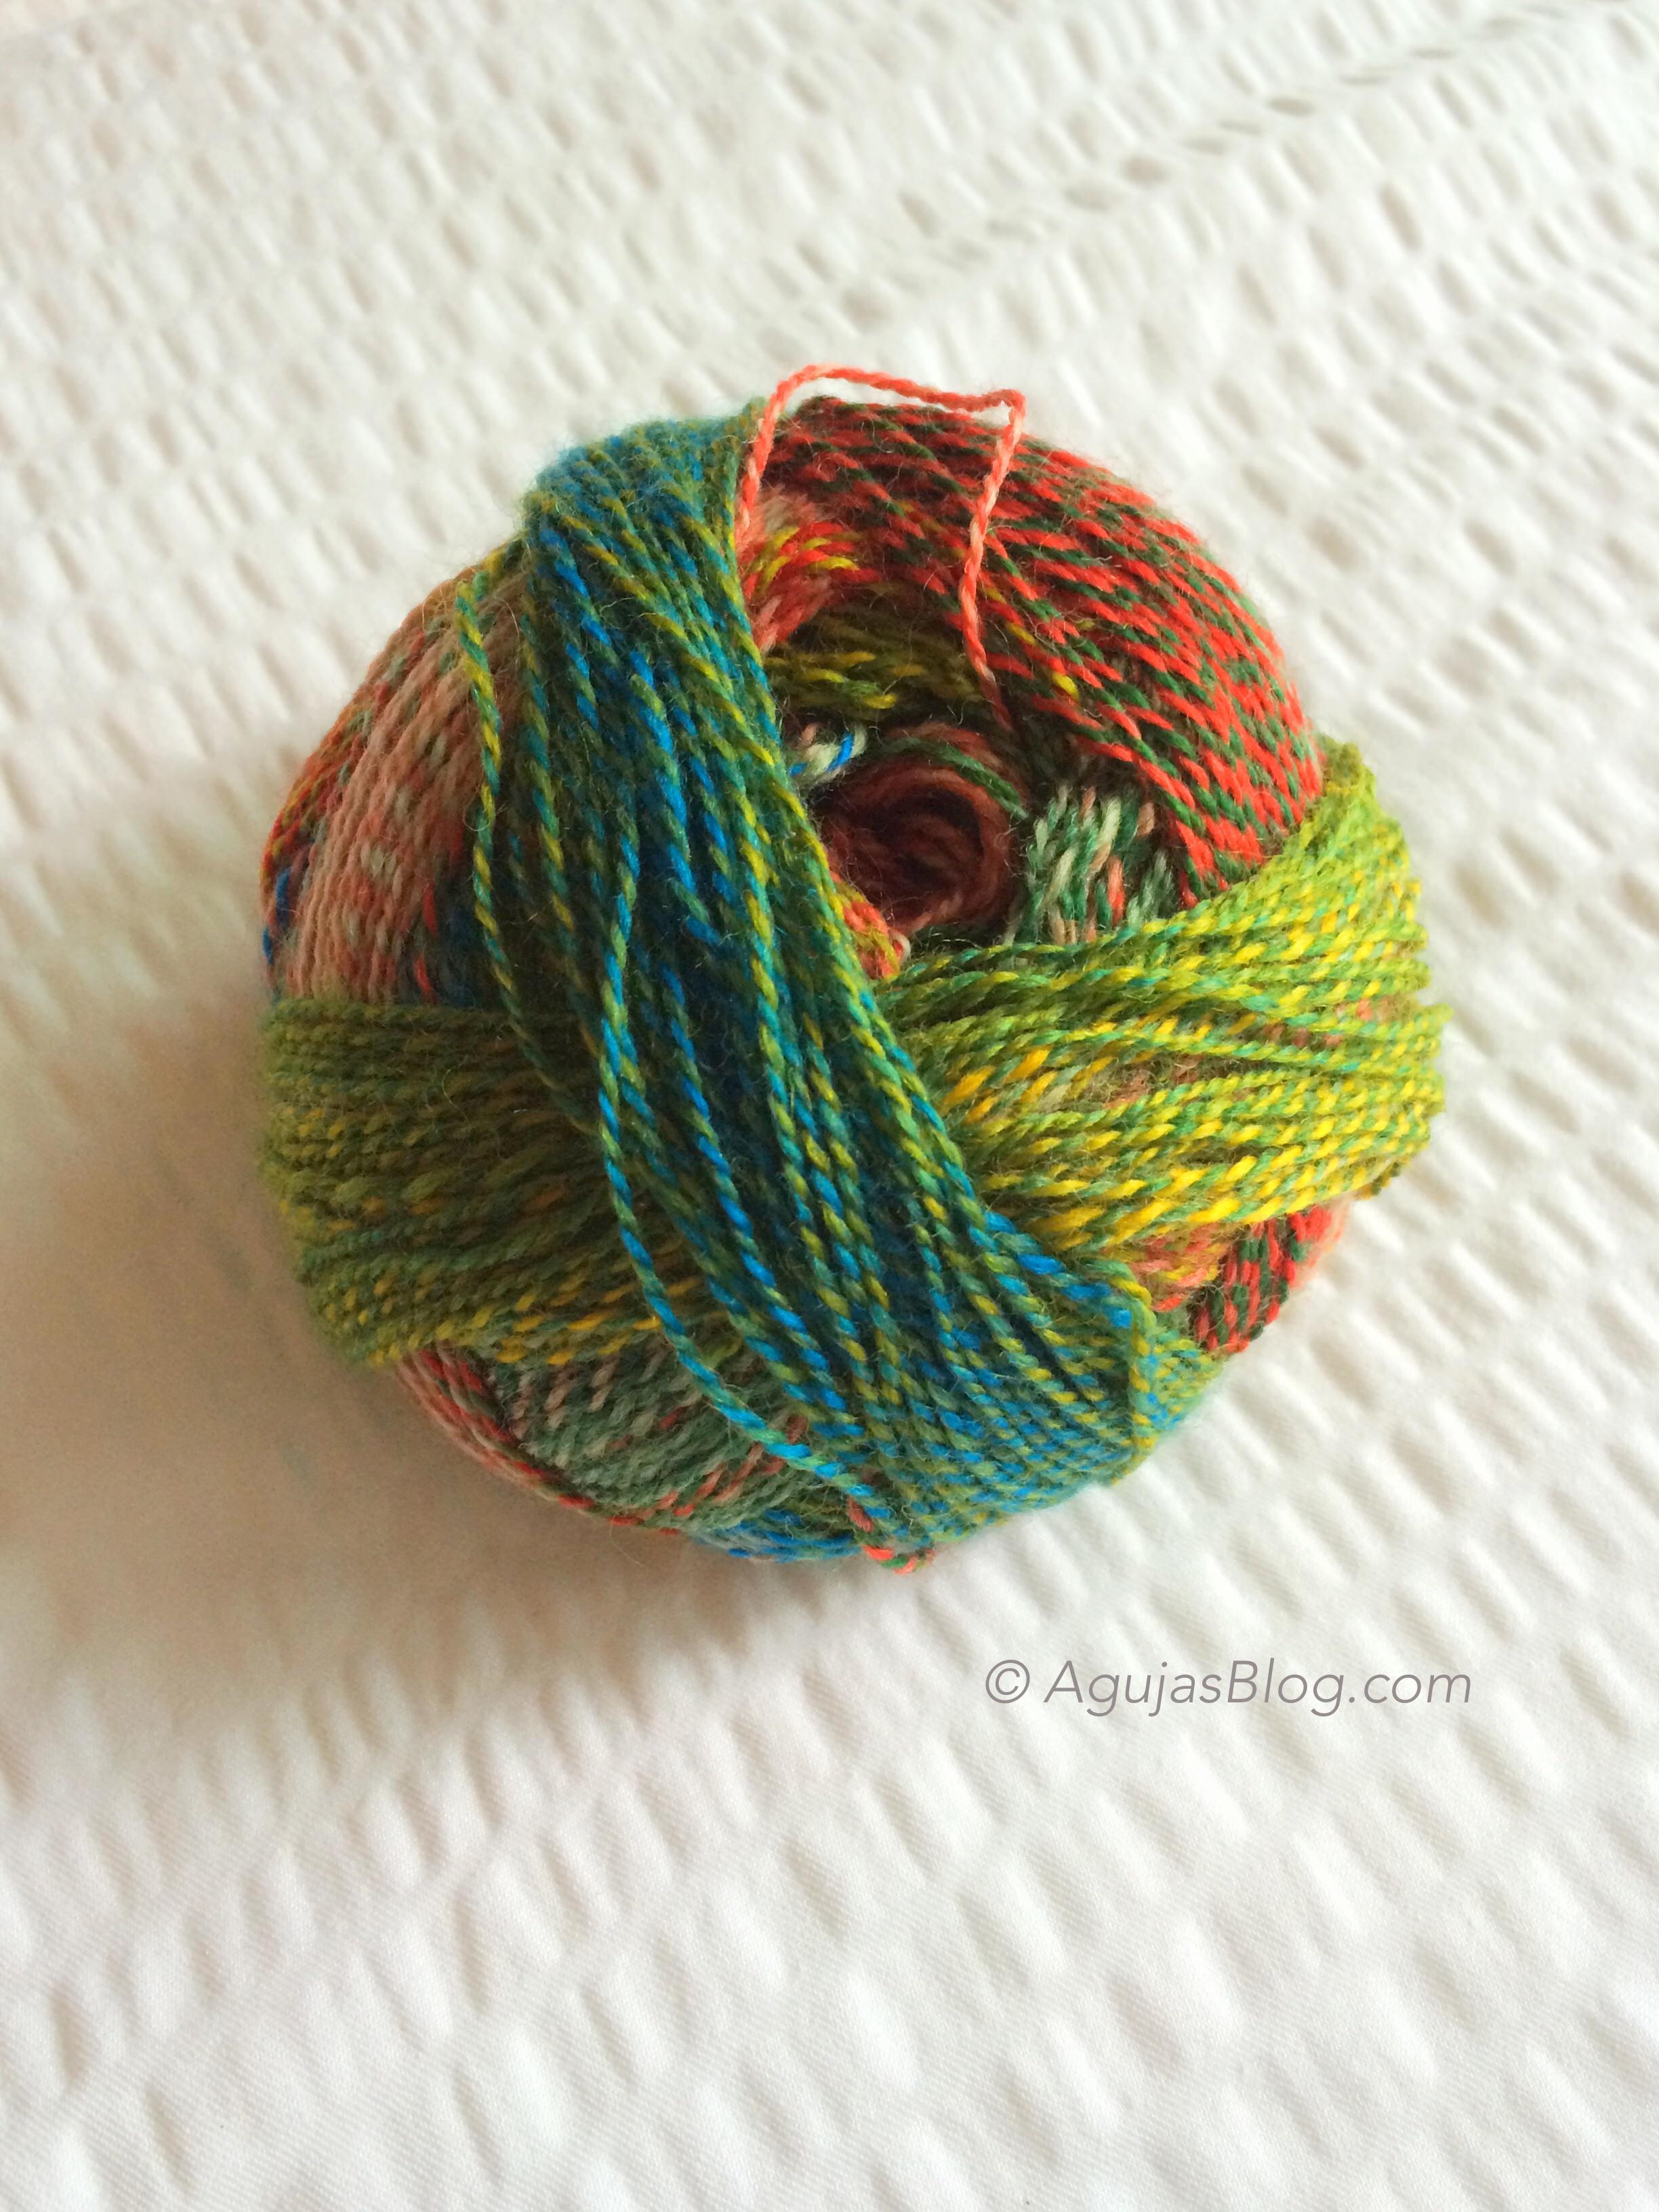 Yarn from Downtown Yarns